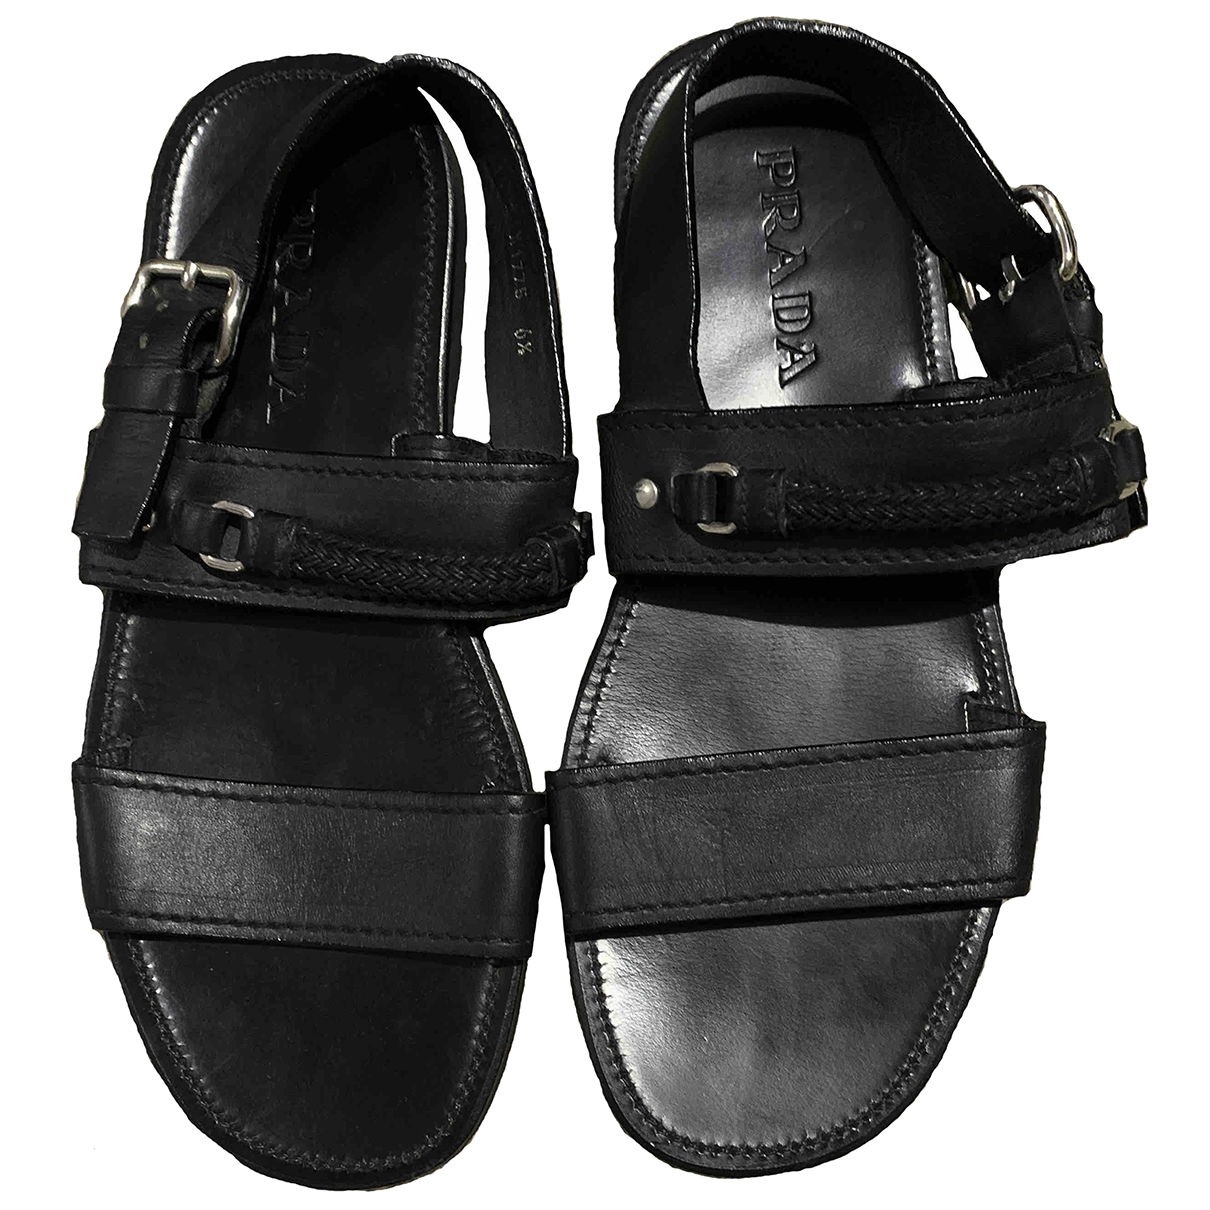 Prada \N Brown Leather Sandals for Women 6.5 UK